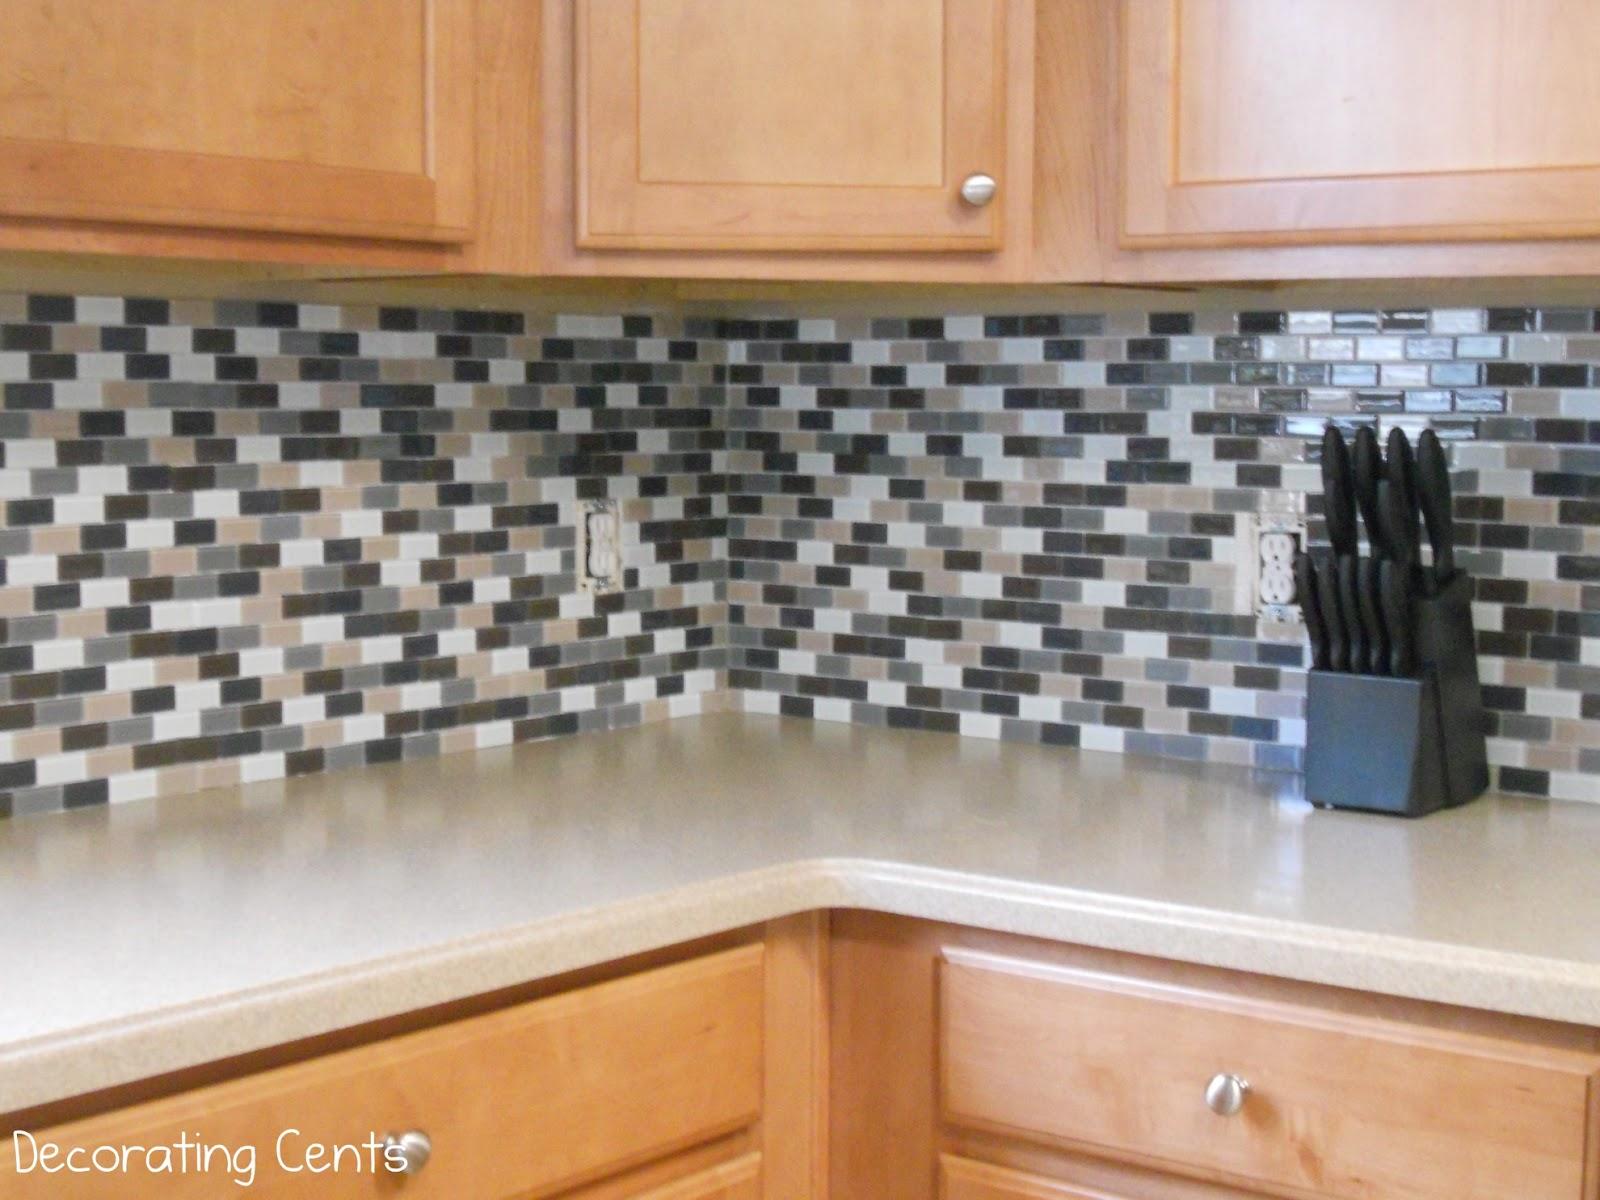 find best wallpapers: kitchen wallpaper that looks like tile - www.smscs.com